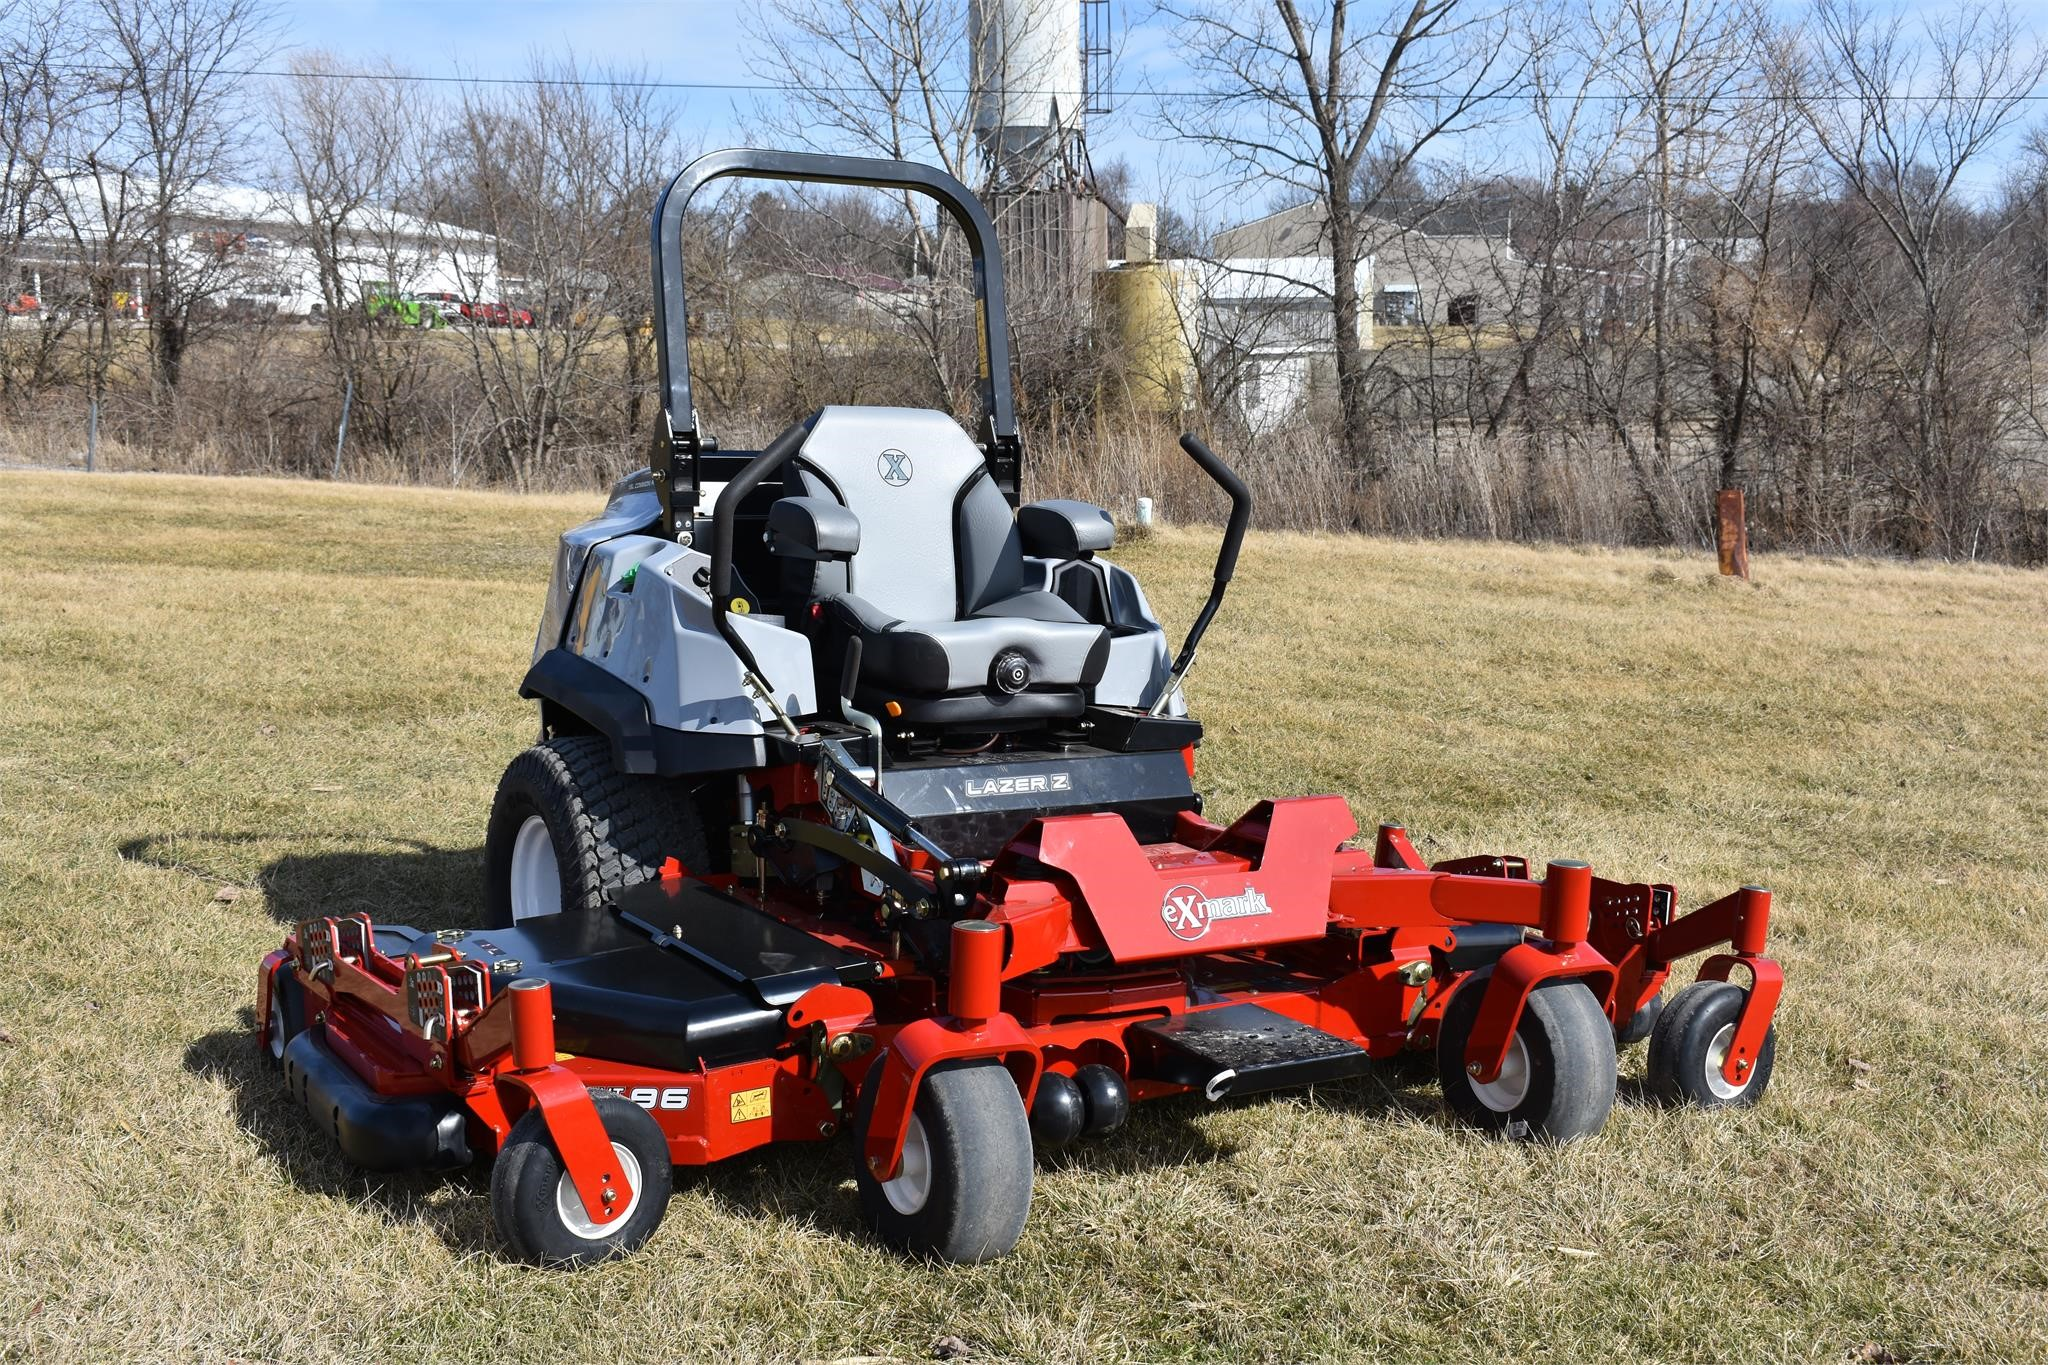 2021 Exmark LZS88CDYM96RW0 Lawn and Garden